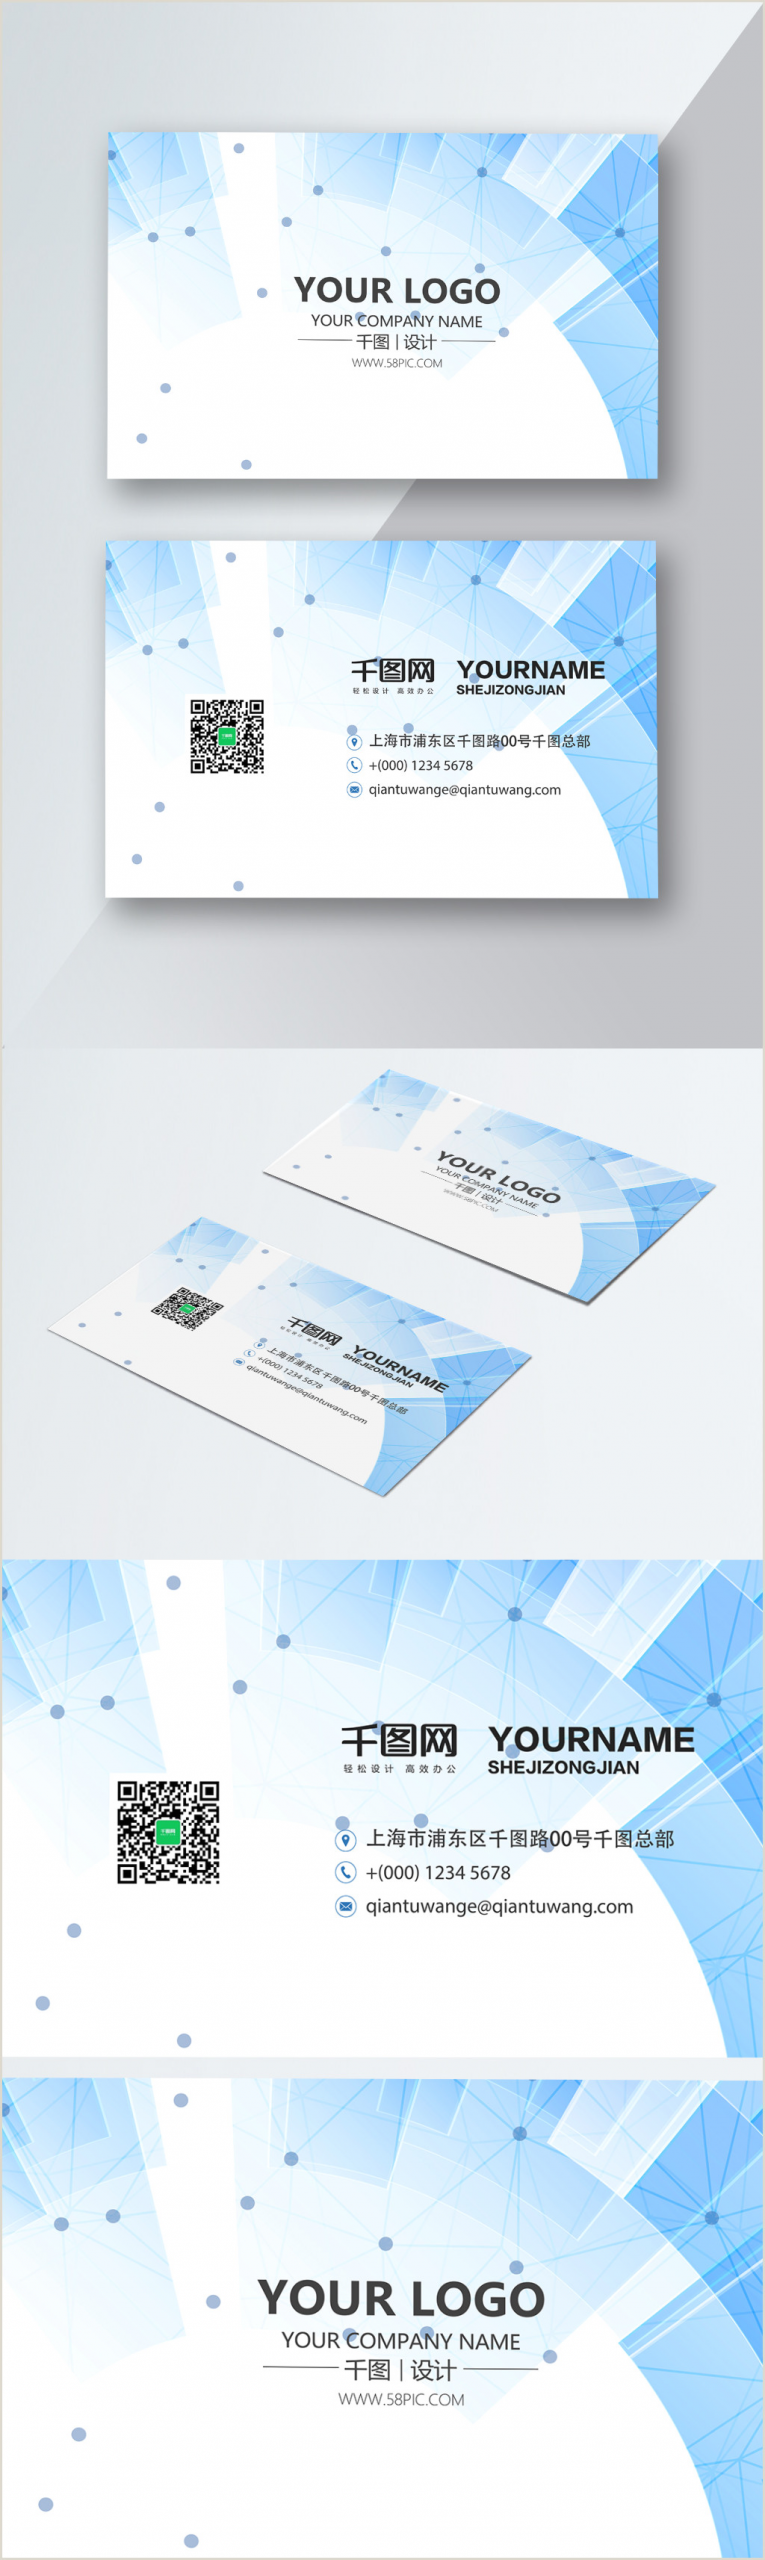 Unique Life Insurance Business Cards Samples Fude Life Insurance Business Card Template Image Picture